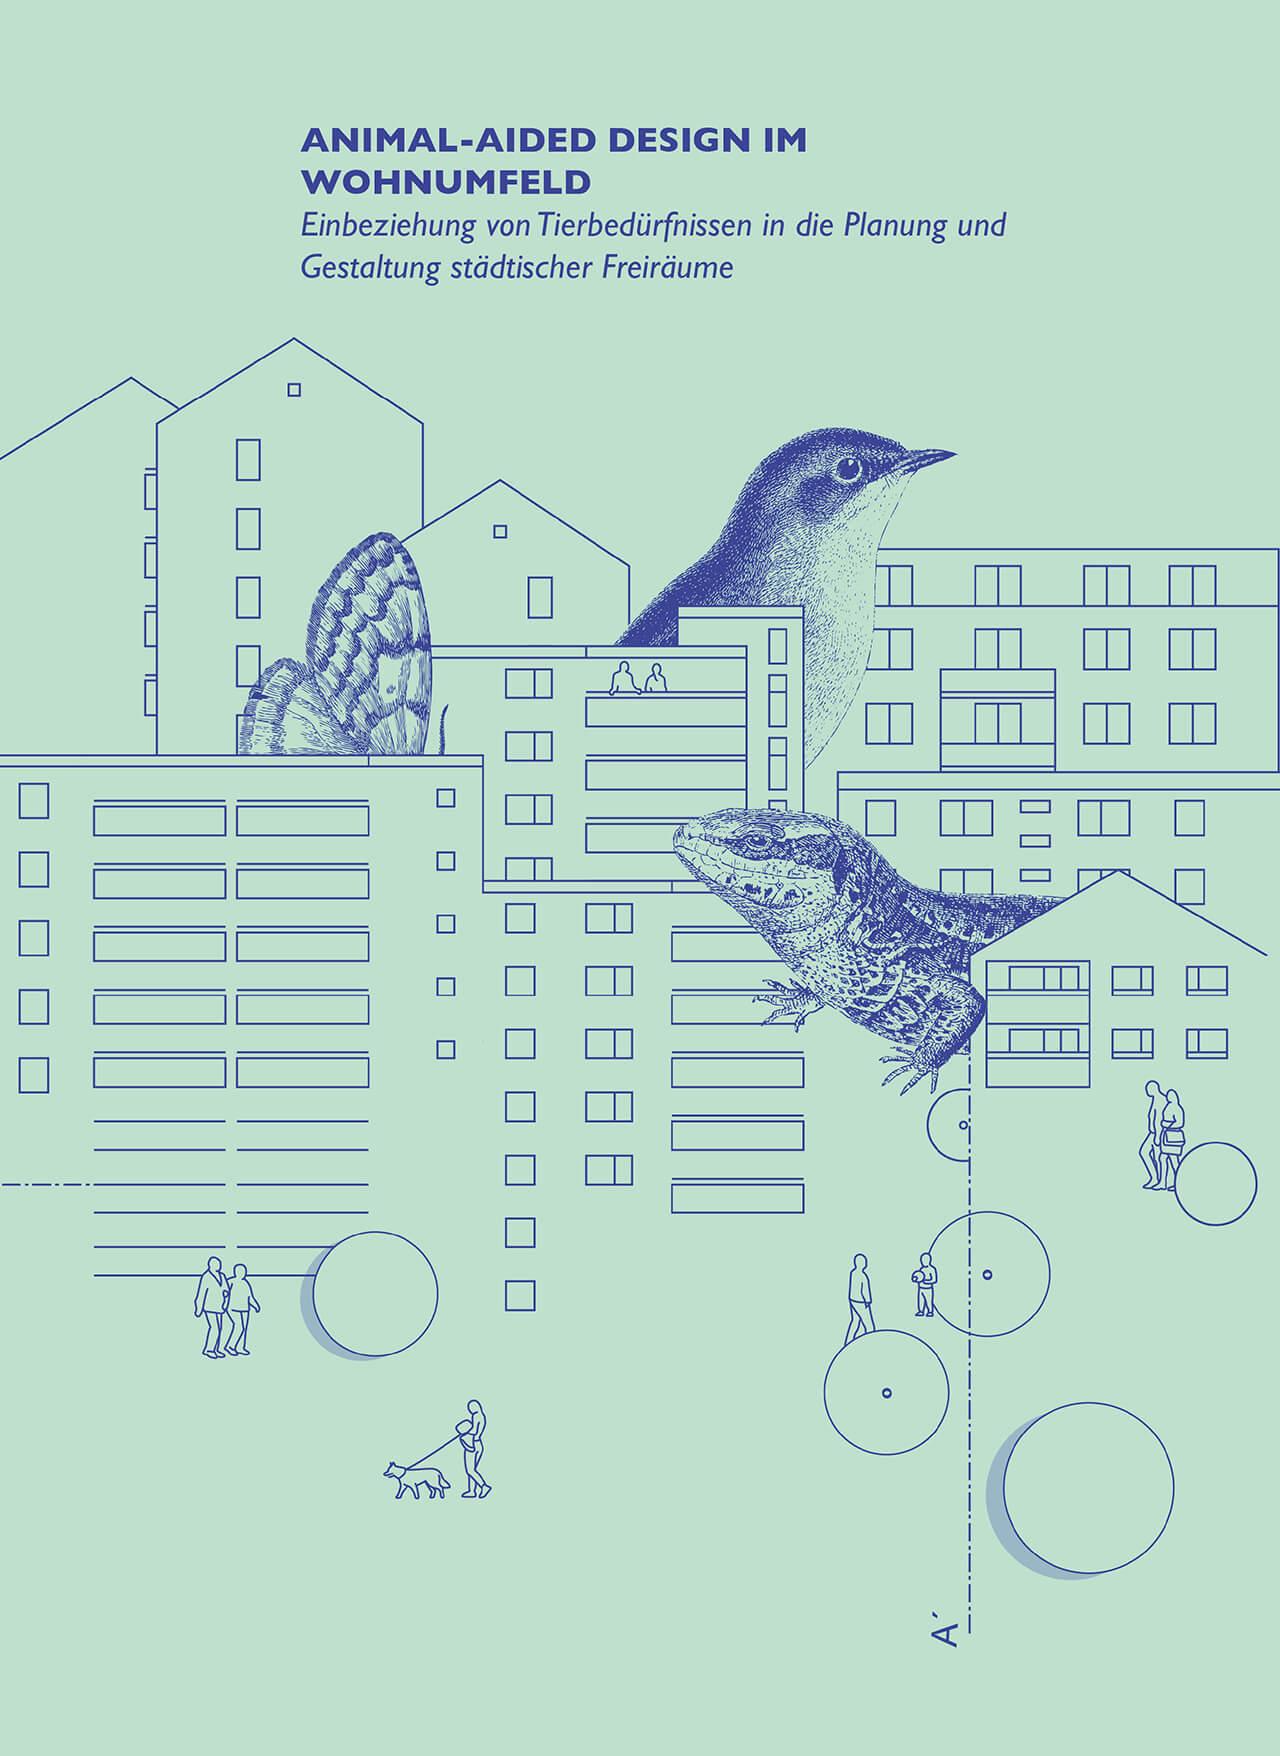 Animal-Aided Design im Wohnumfeld – Graphic by Sophie Jahnke